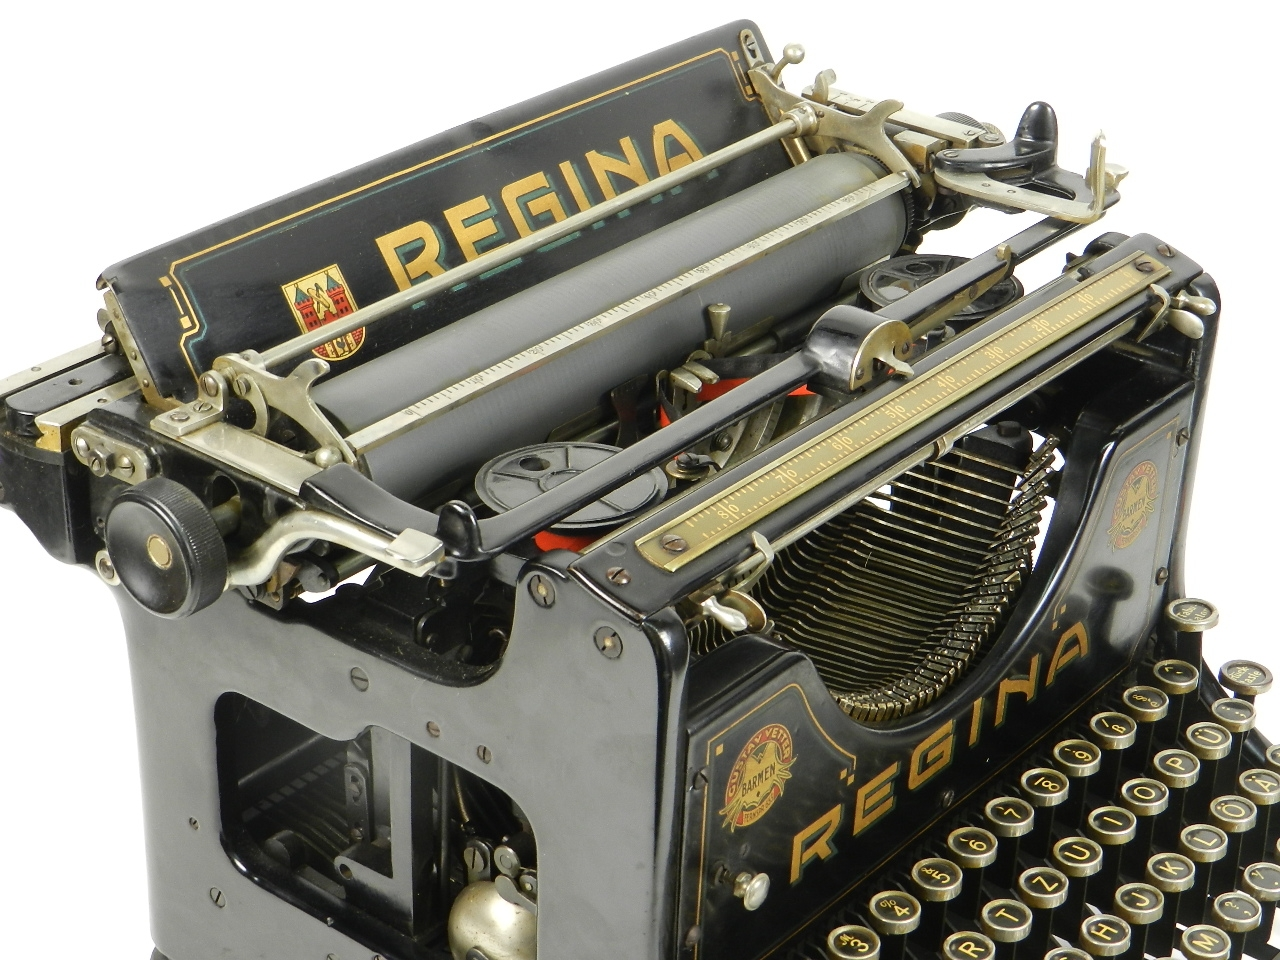 Imagen REGINA MODEL VII AÑO 1923 29443